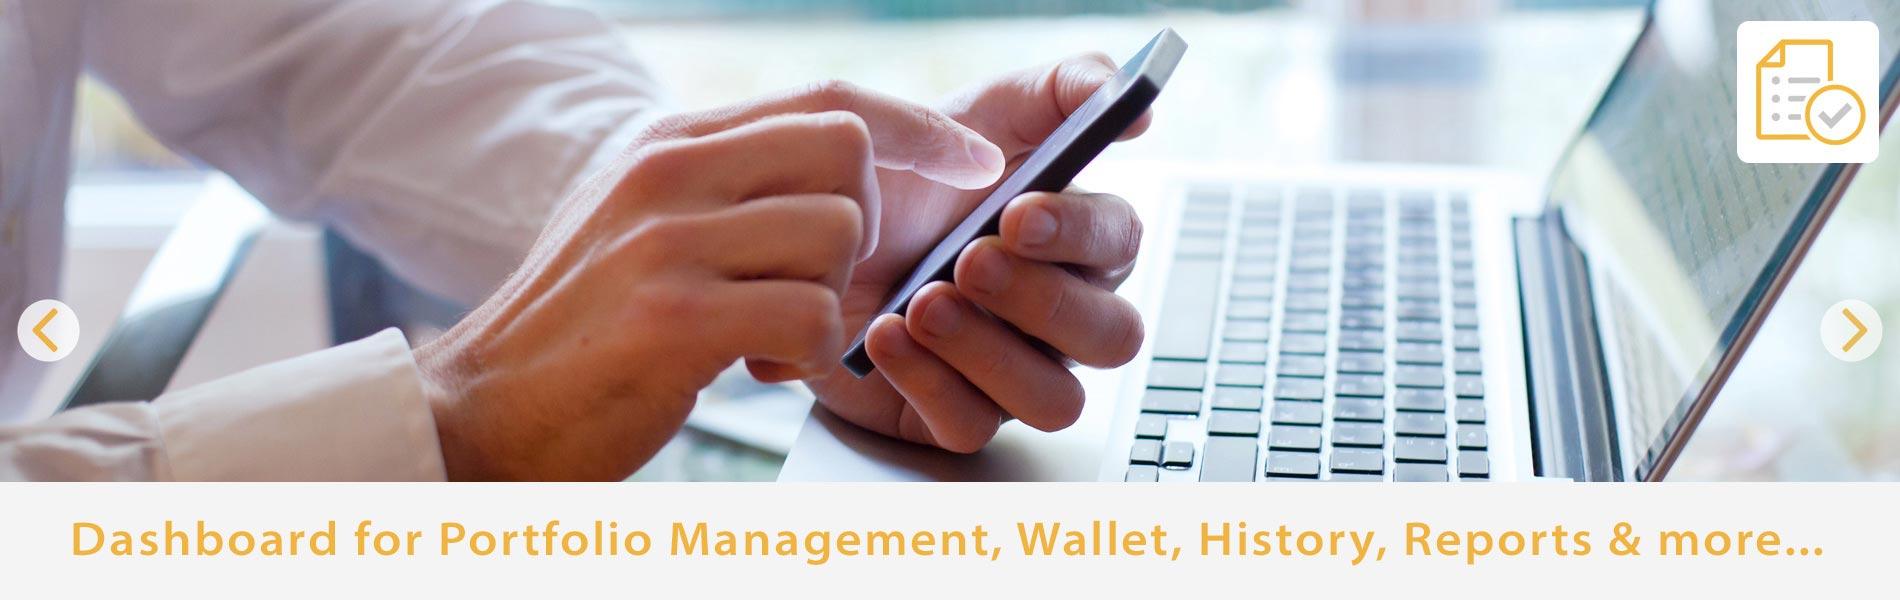 Central Bullion Dashboard for Portfolio Management